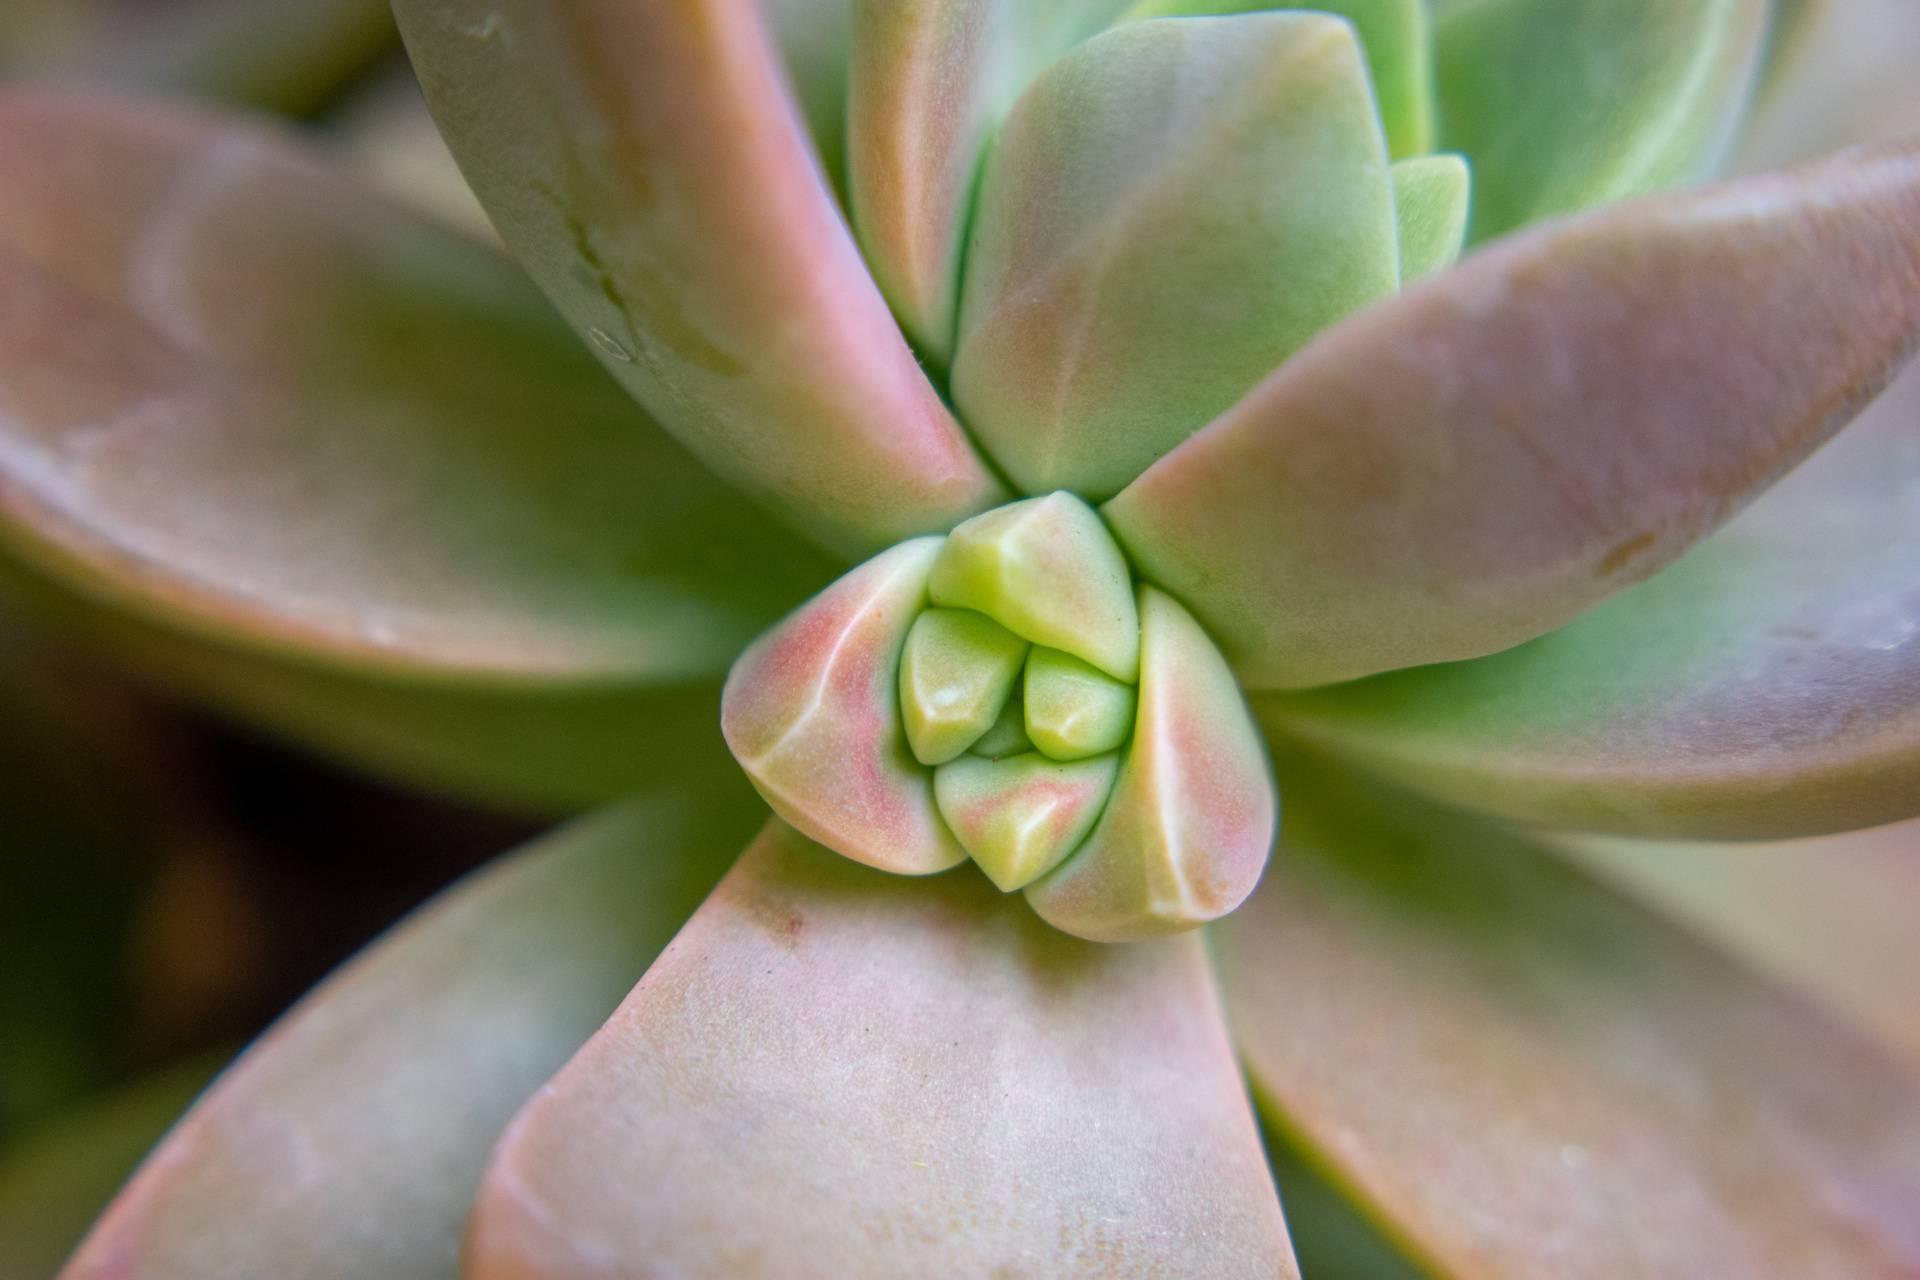 Aloe vera up close